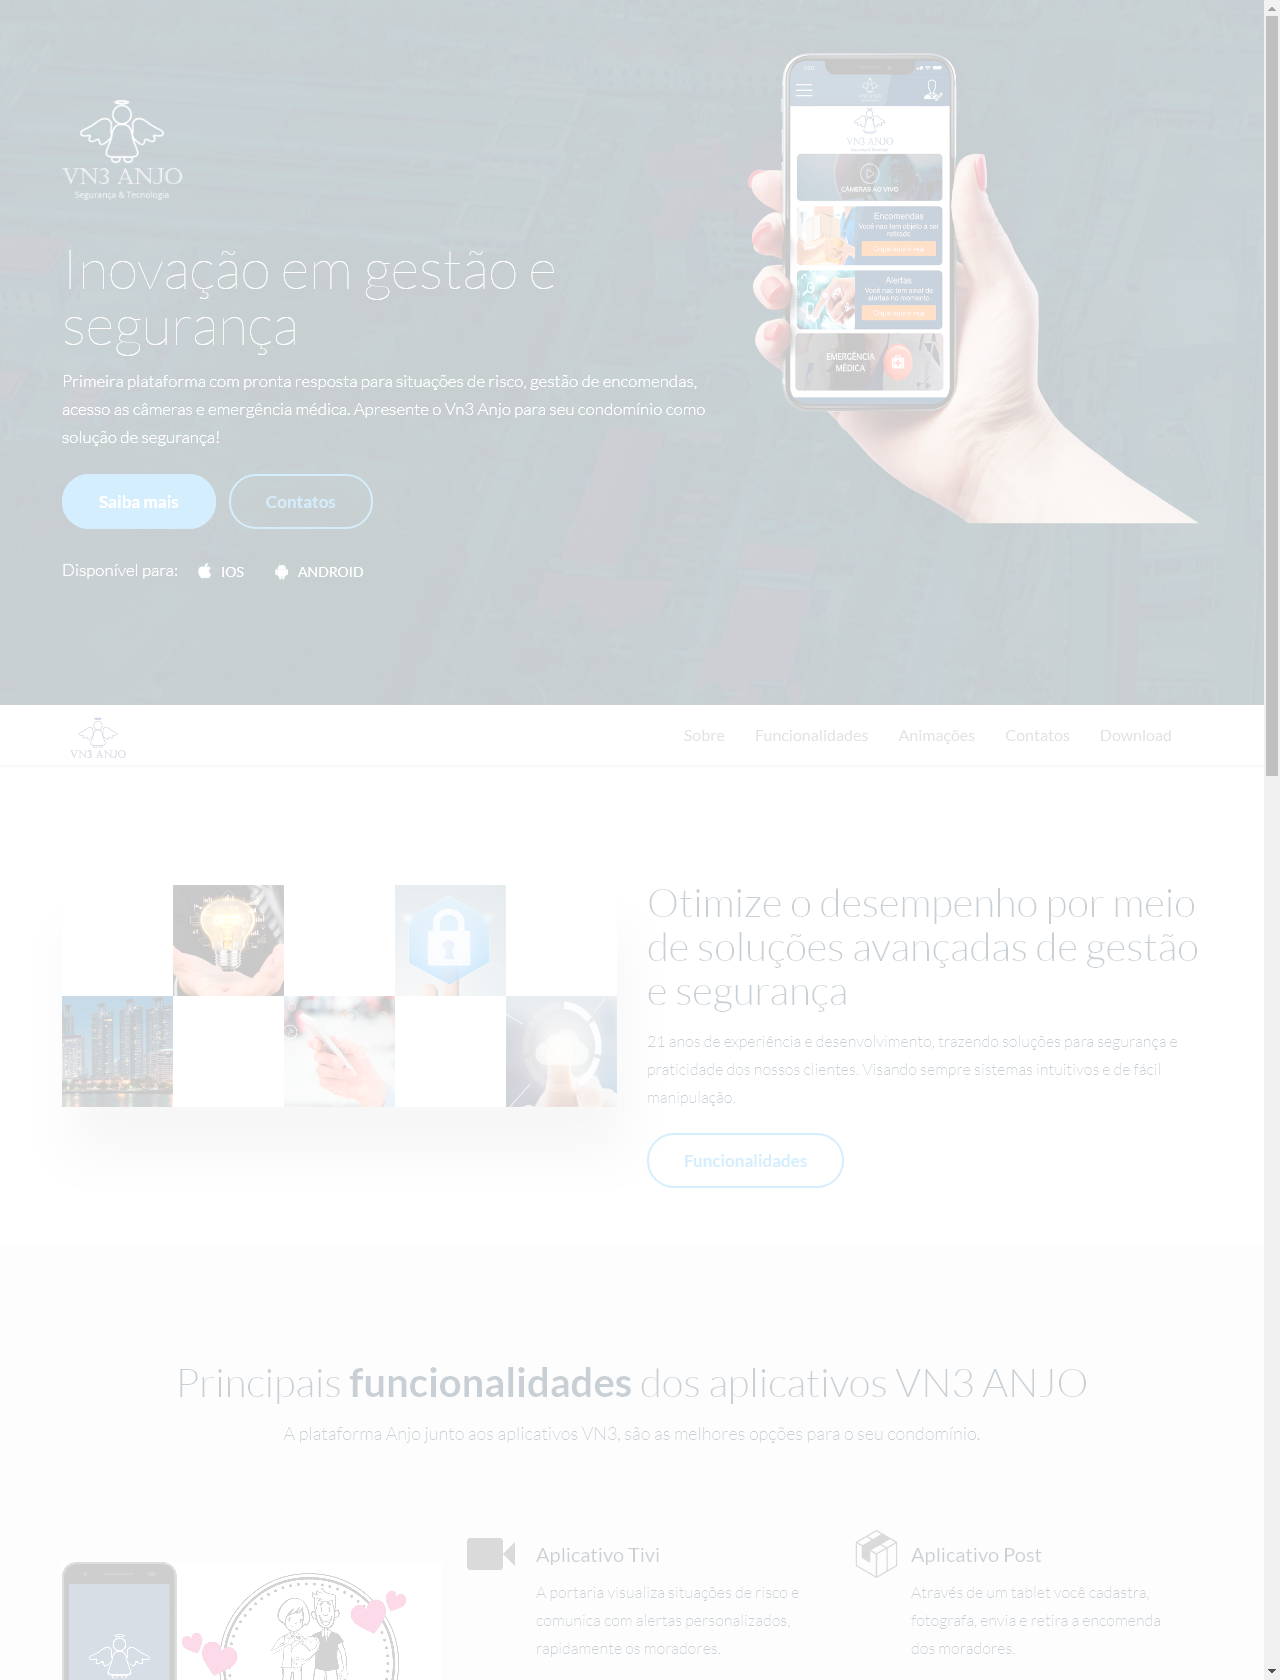 Screenshot Desktop - https://vn3anjo.com.br/br/